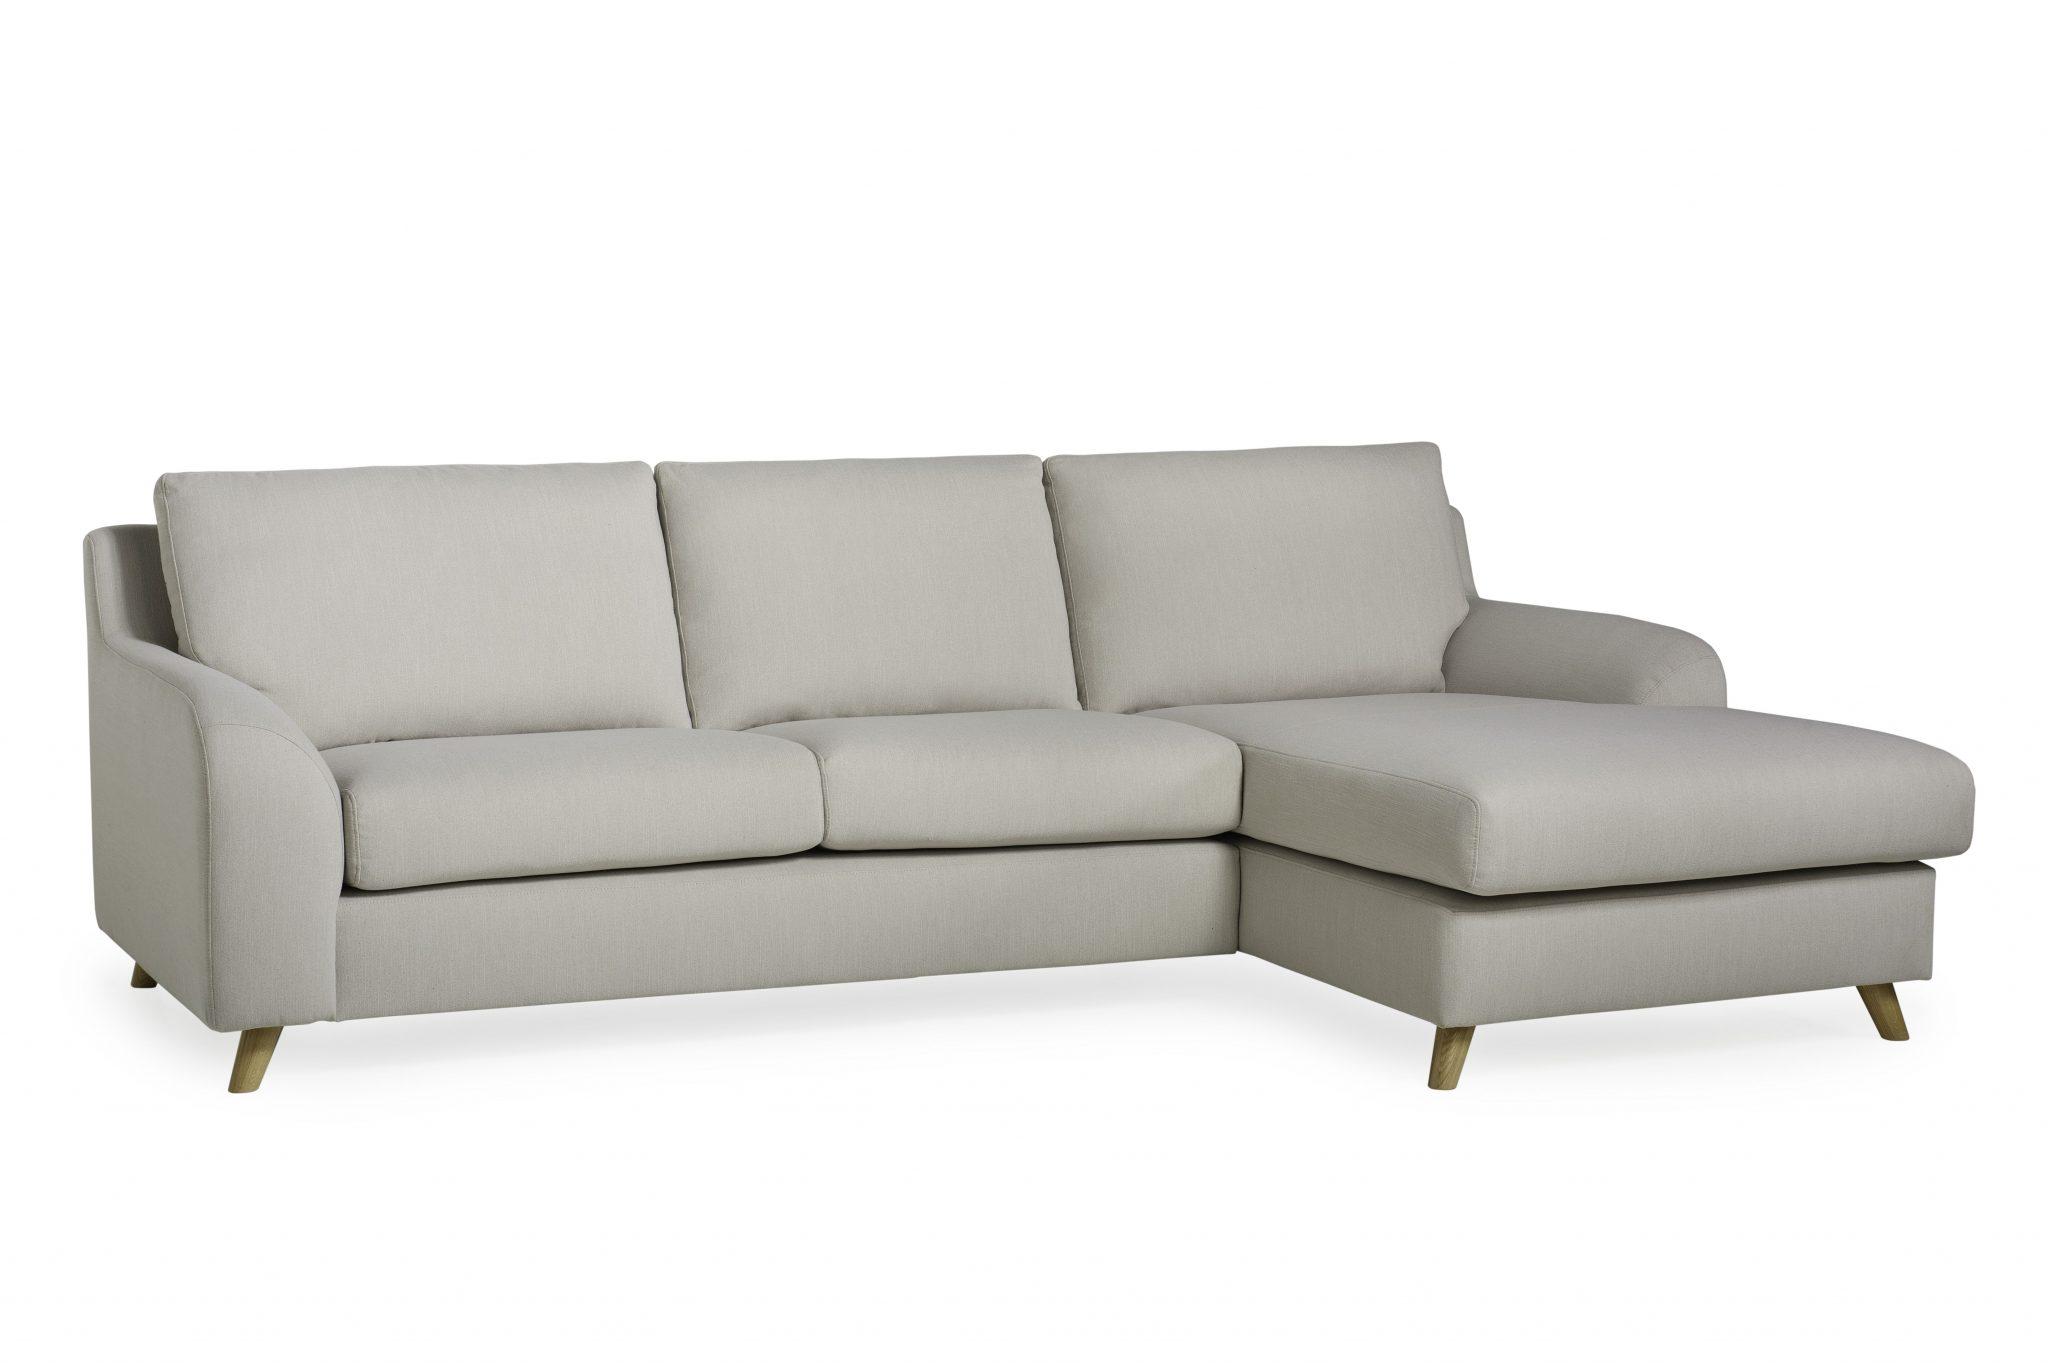 nordic style furniture. Nordic Living Scandinavian Style Softnord Furniture